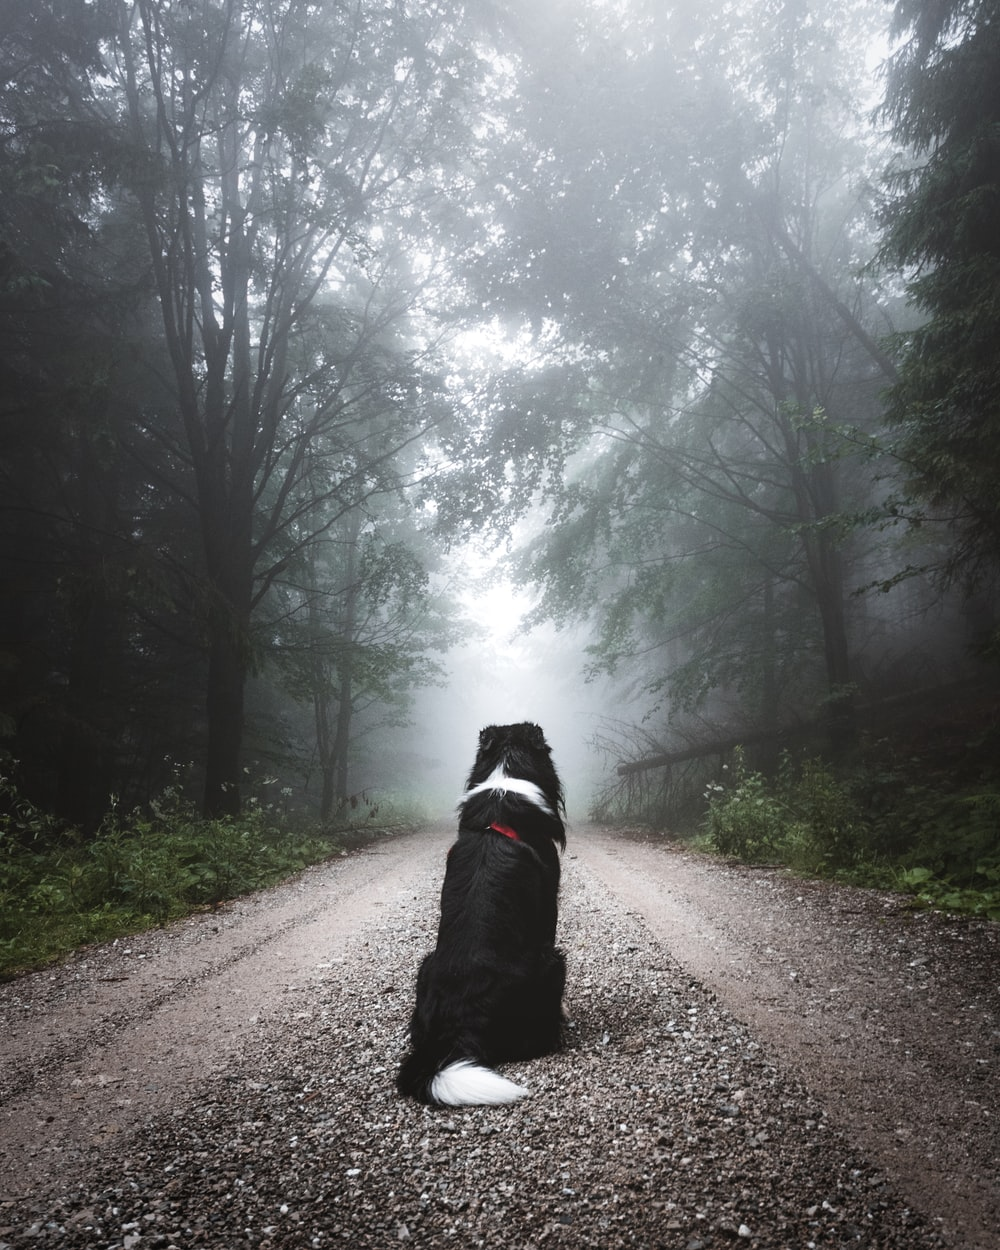 short-coated black and white dog sitting on road path